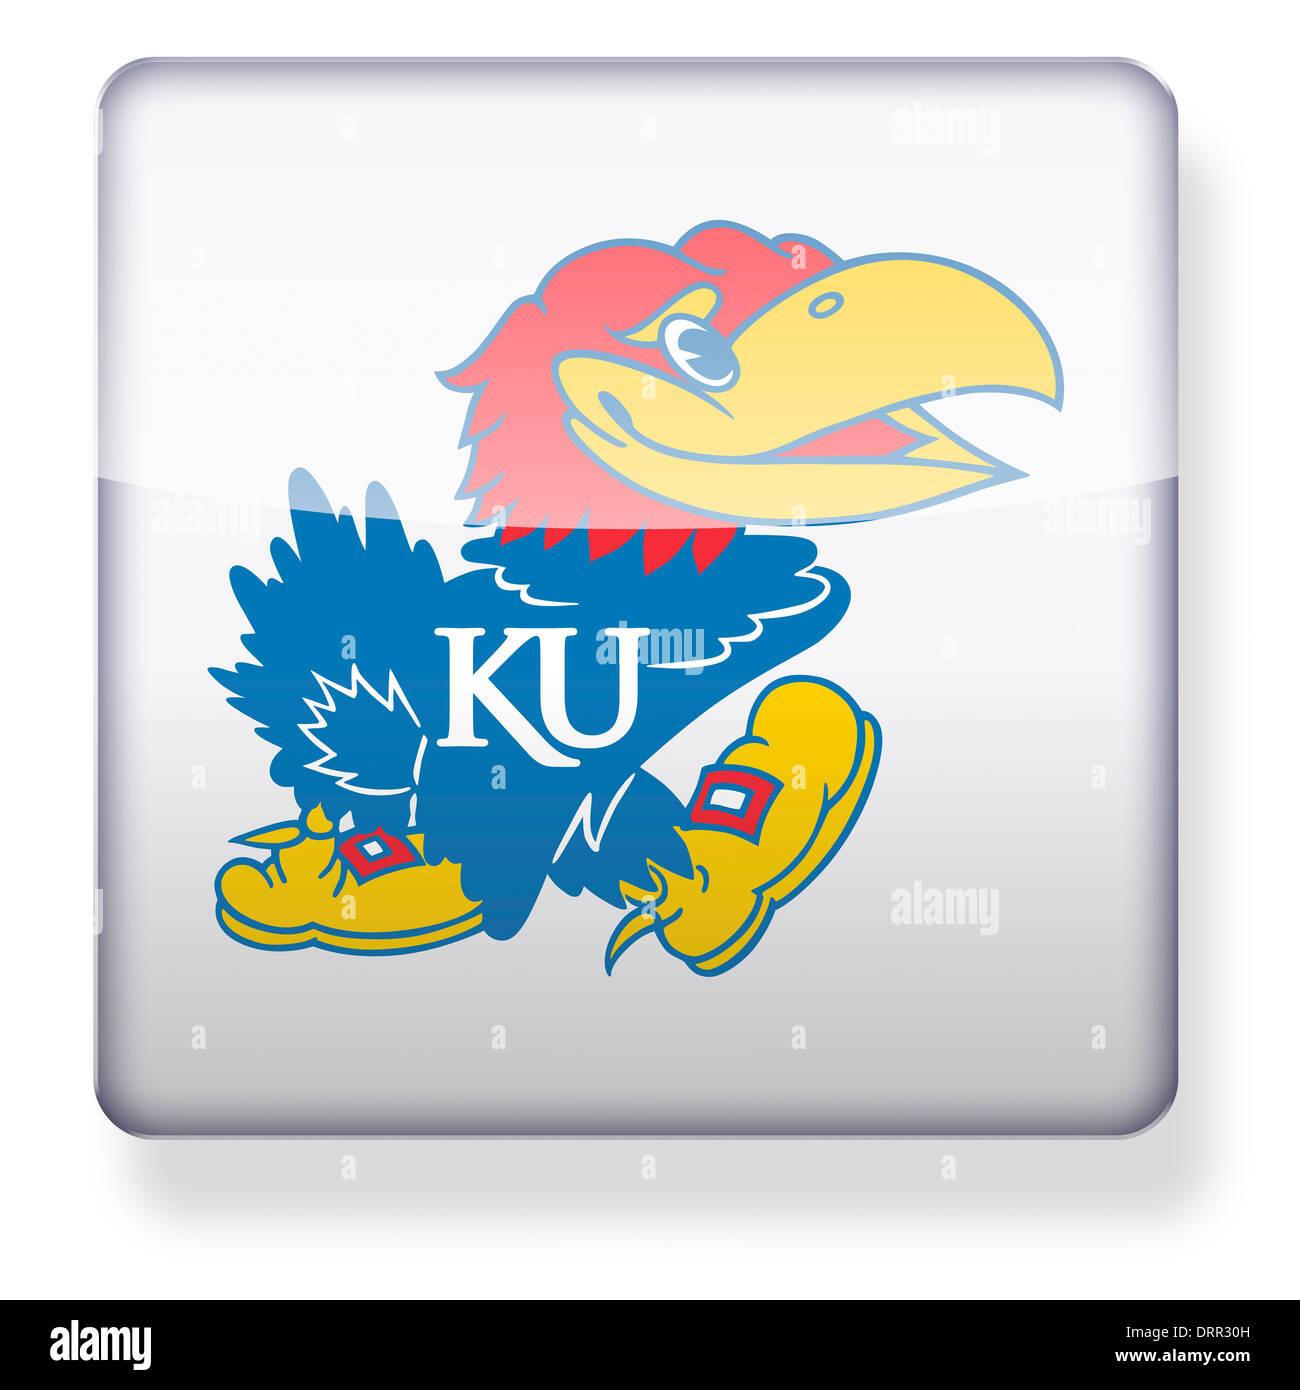 Kansas Jayhawks Us College Football Logo As An App Icon Clipping